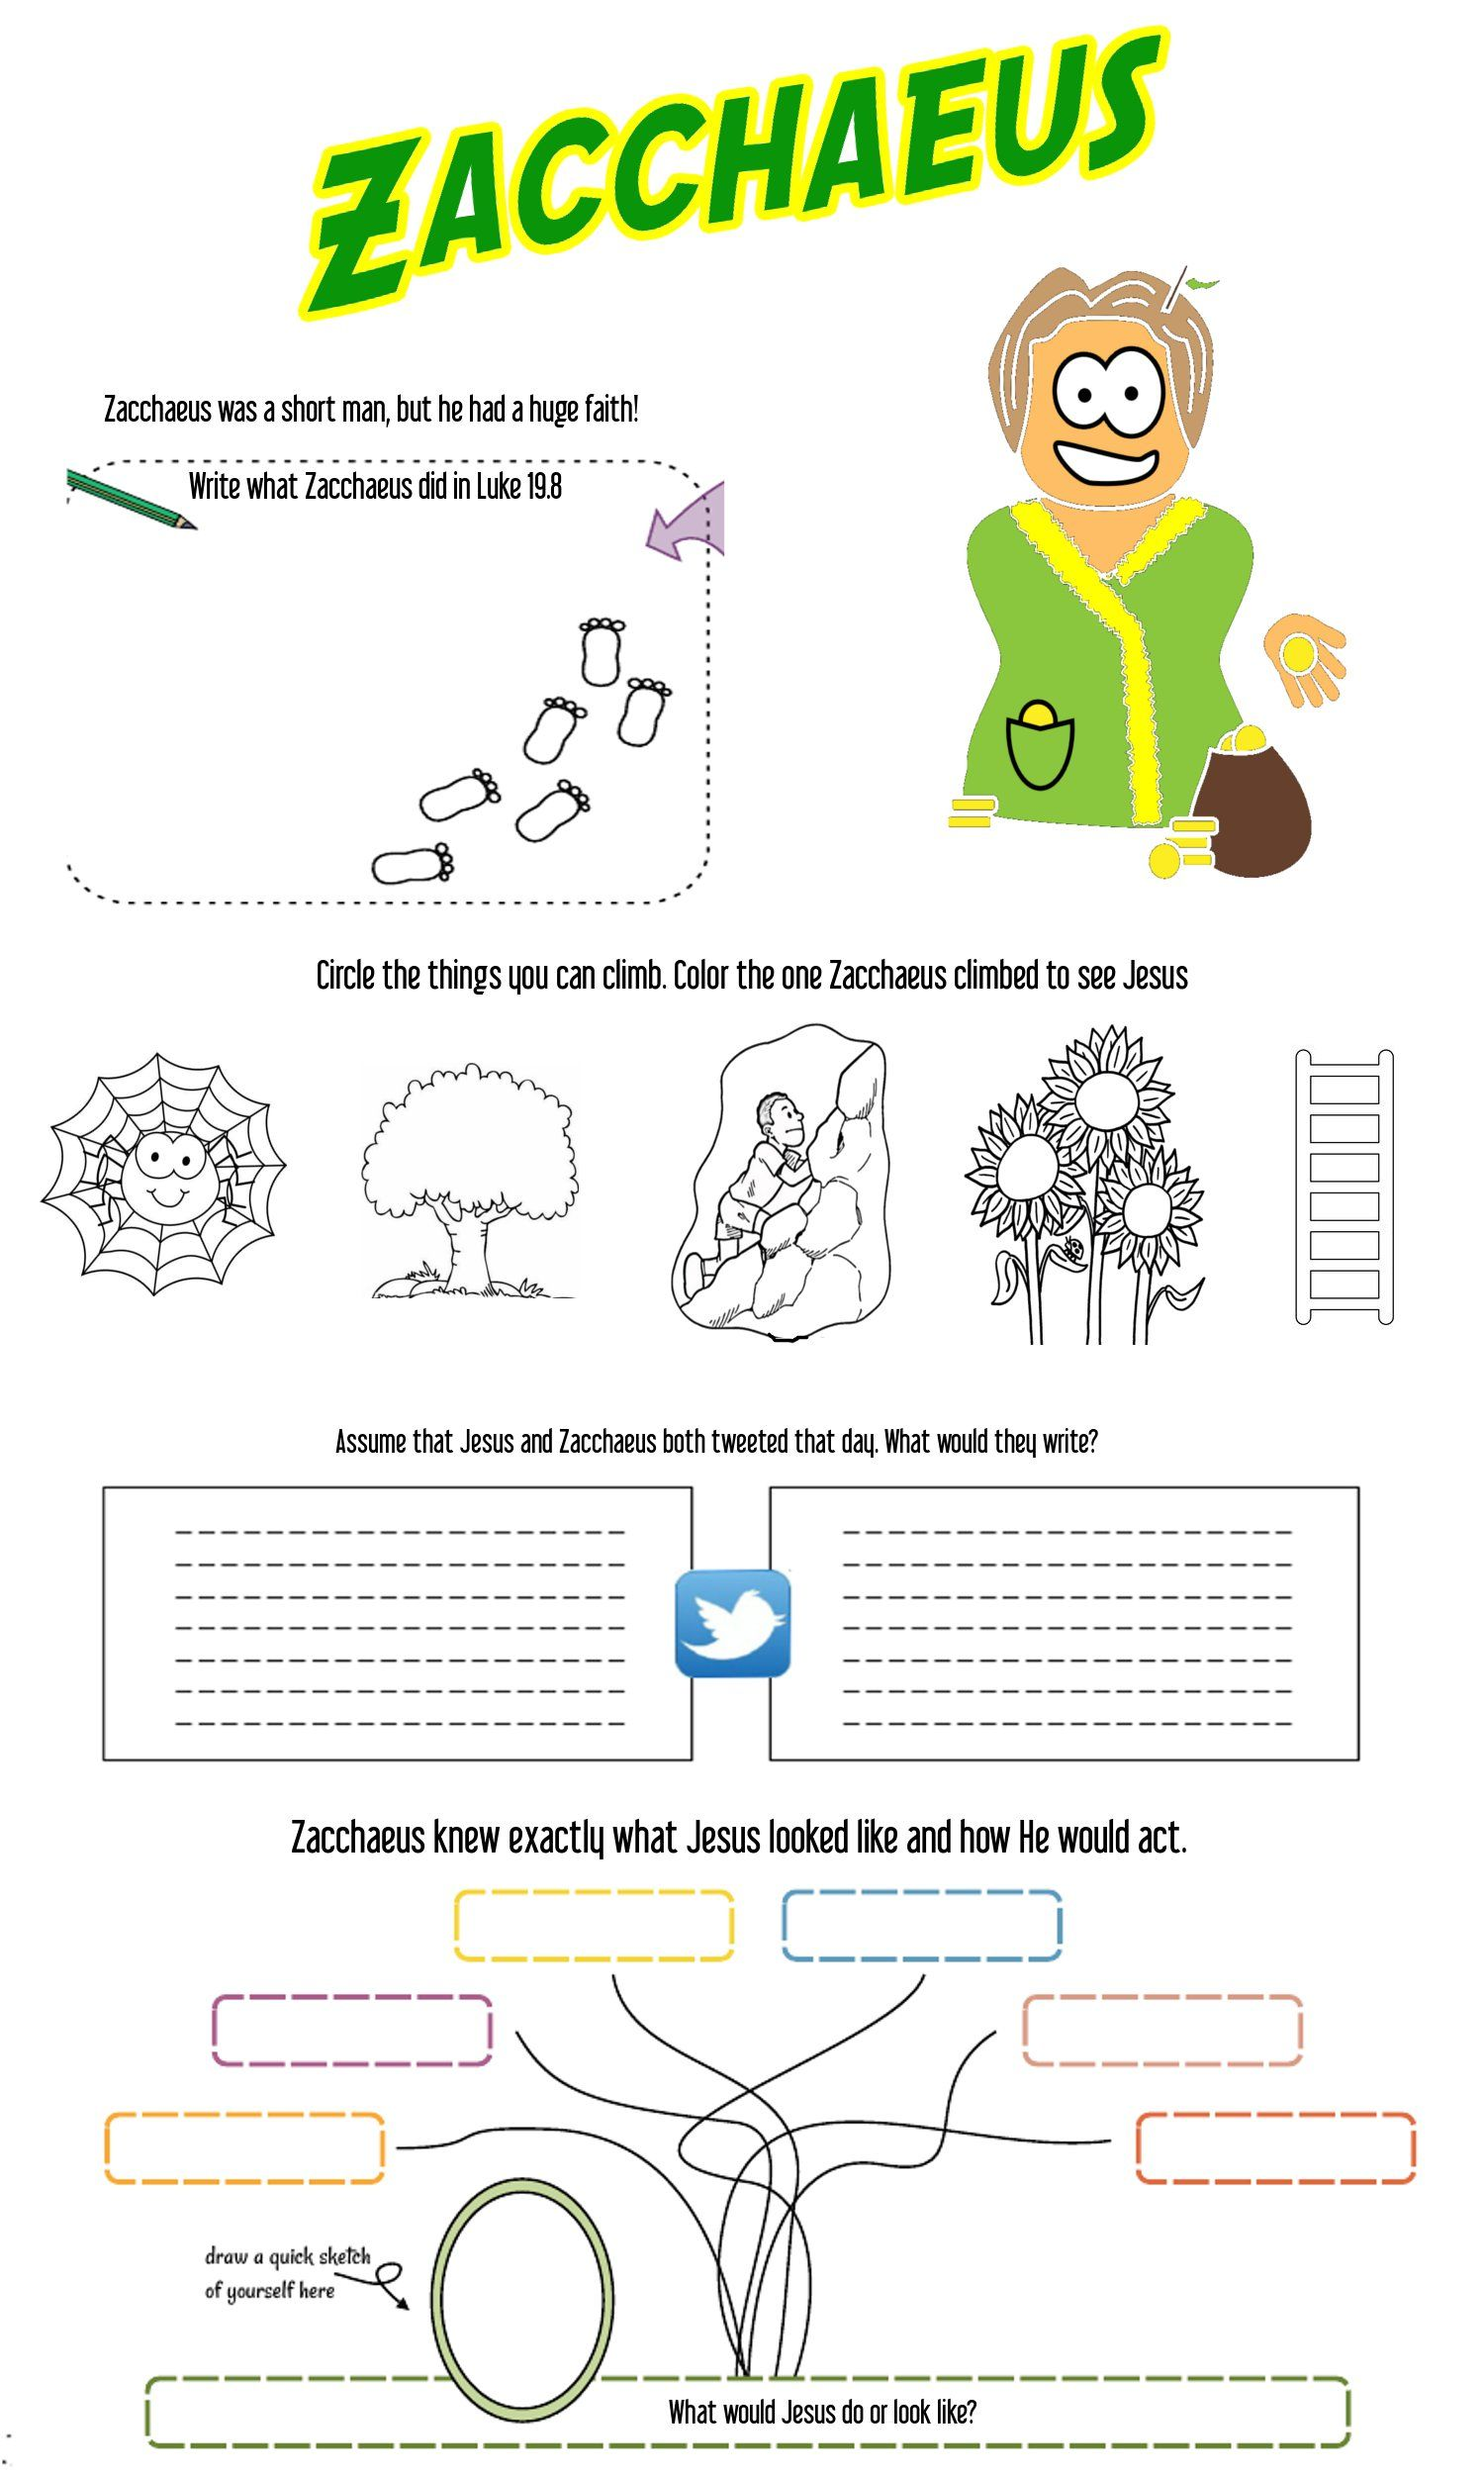 worksheets about zacchaeus kidz activities. Black Bedroom Furniture Sets. Home Design Ideas